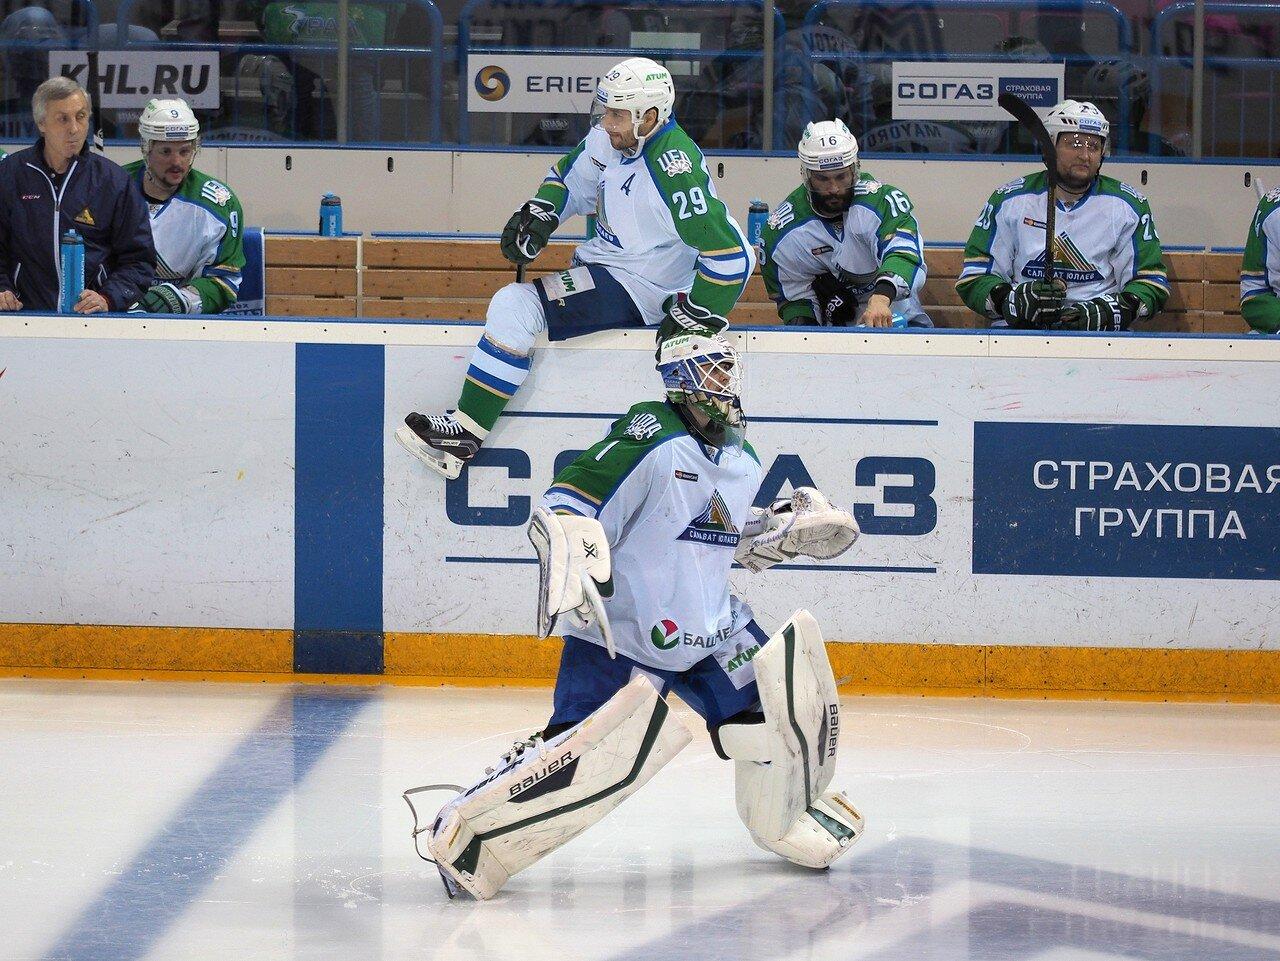 113Плей-офф 2016 Восток Финал Металлург - Салават Юлаев 23.03.2016